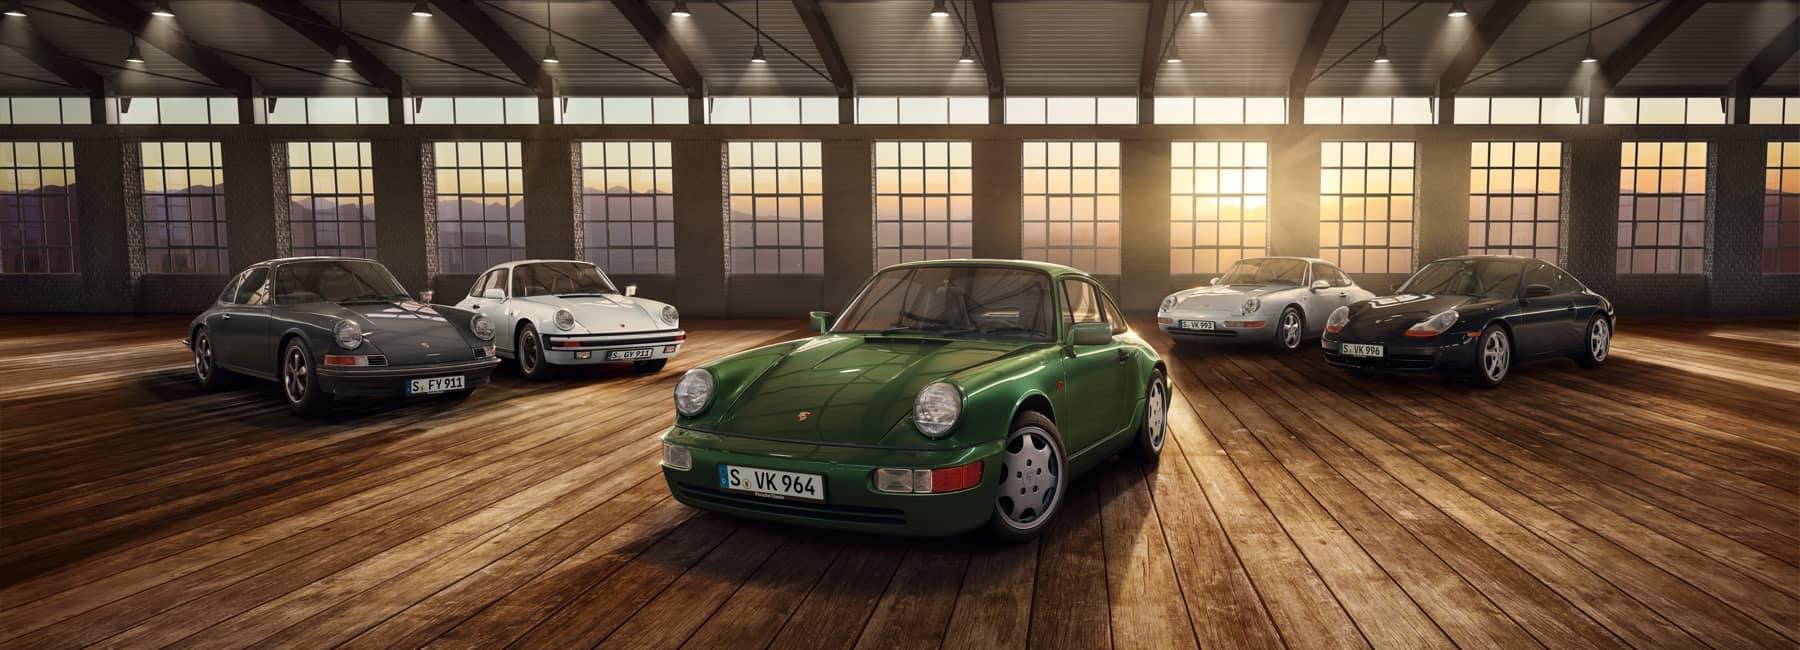 Porsche-Classic-4